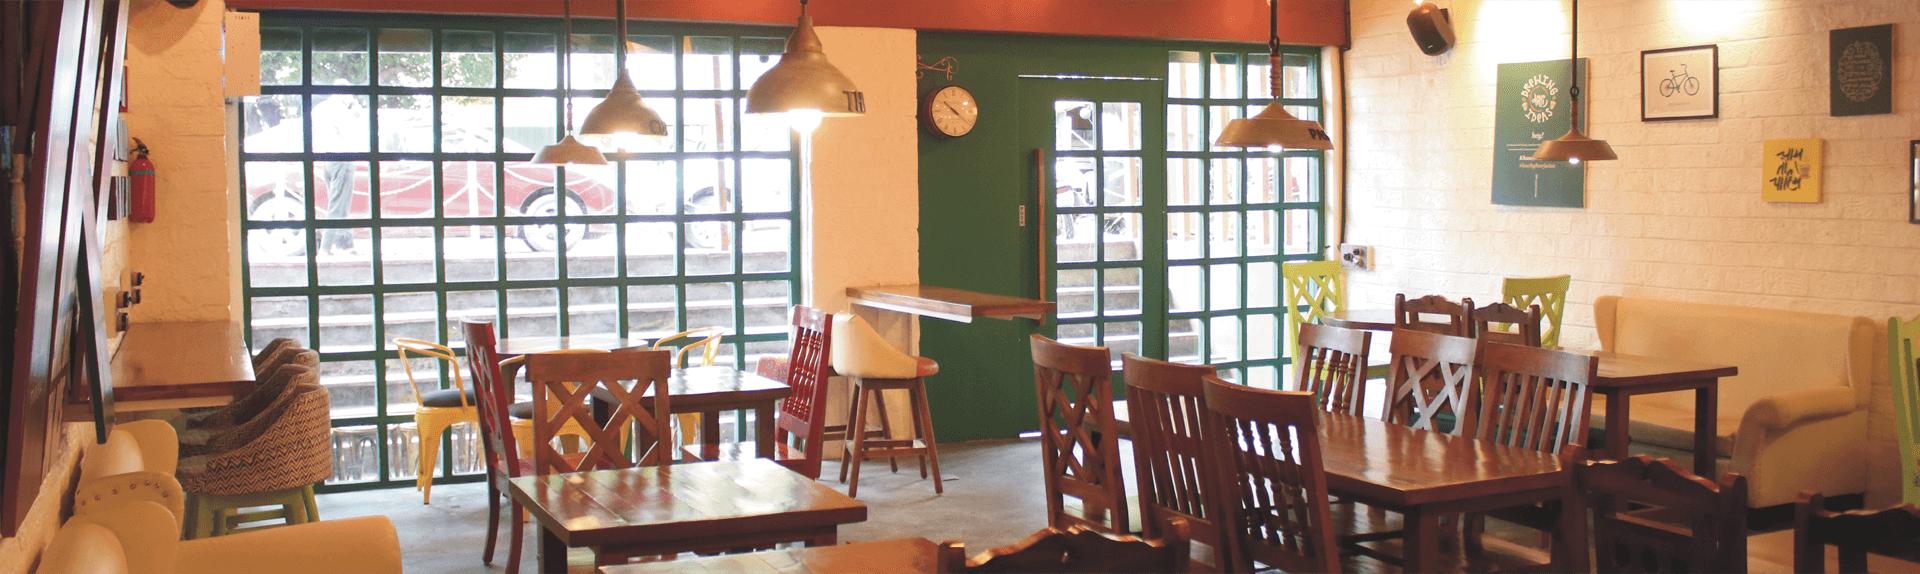 mitti-cafe